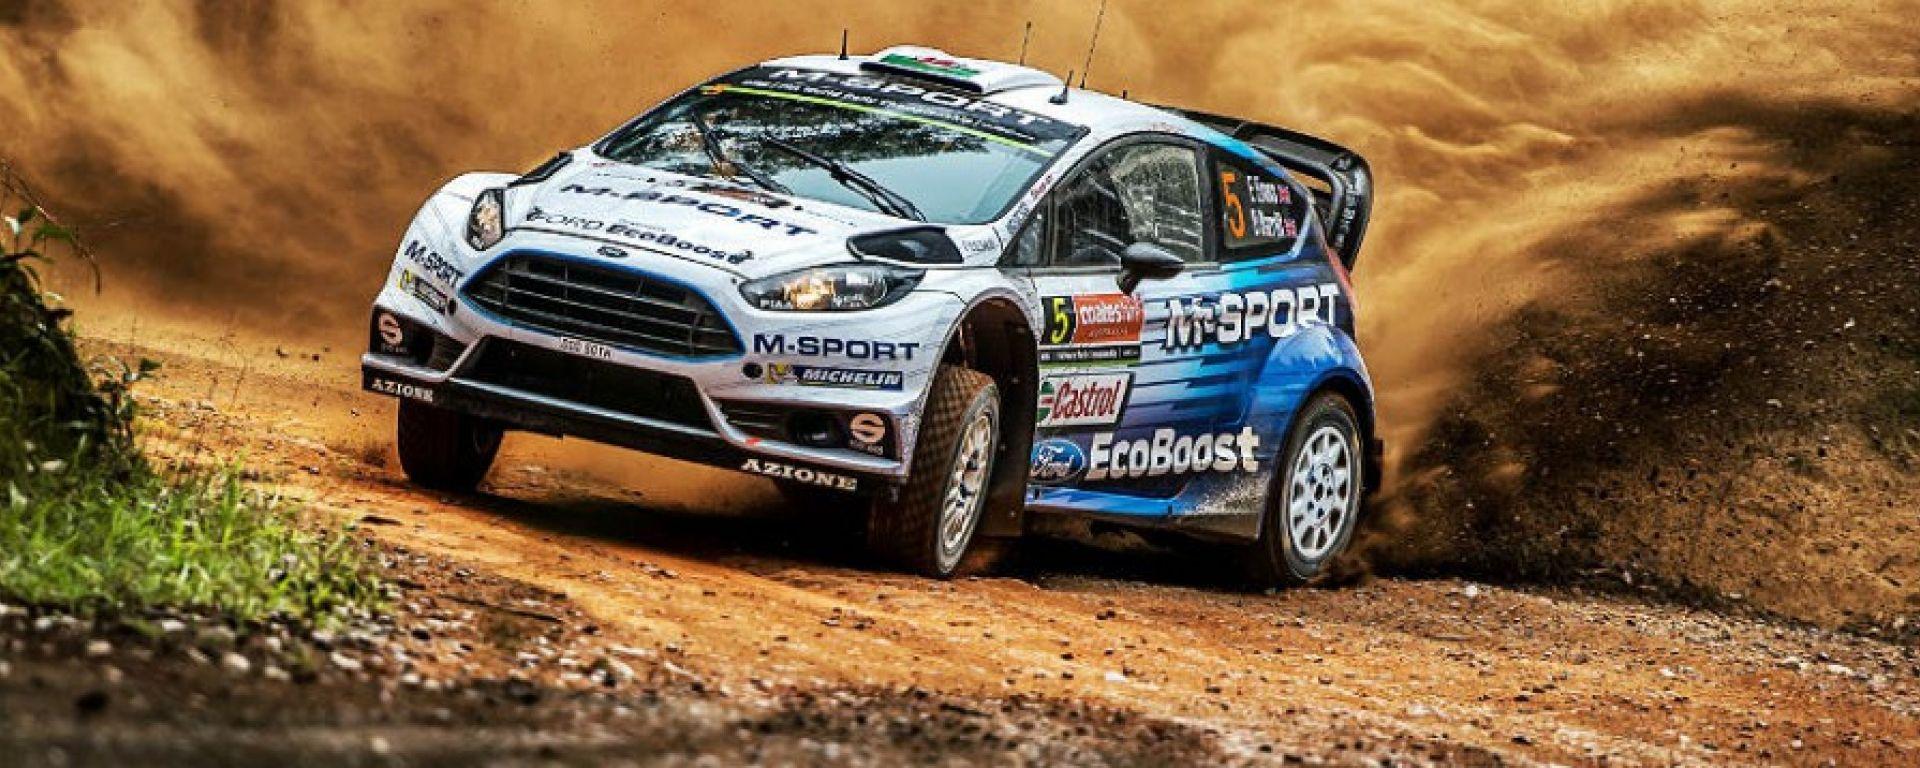 Tanak - WRC 2016